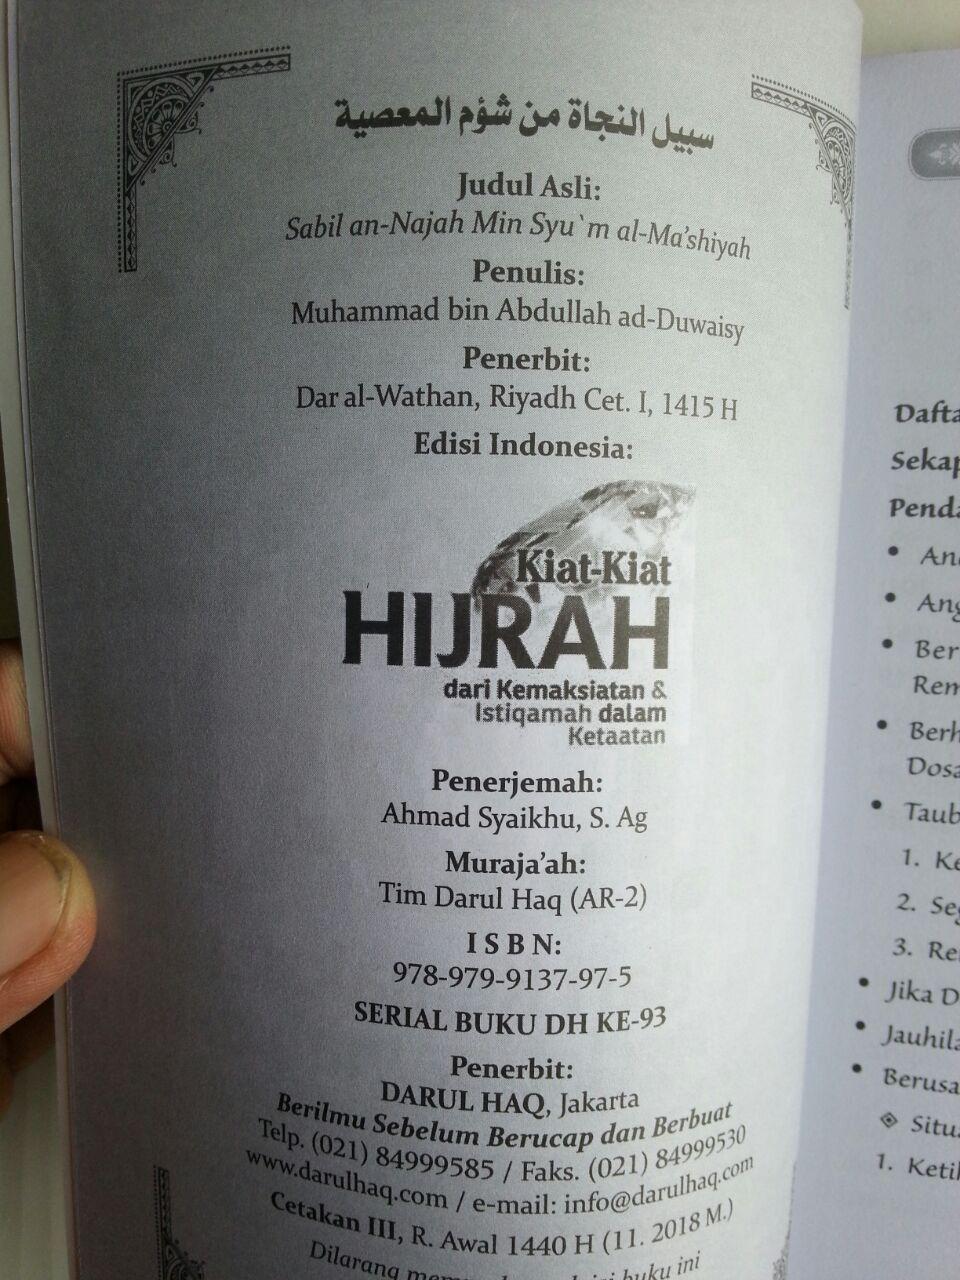 Buku Kiat-Kiat Hijrah Dari Kemaksiatan Kemudian Istiqomah Dalam Ketaatan isi